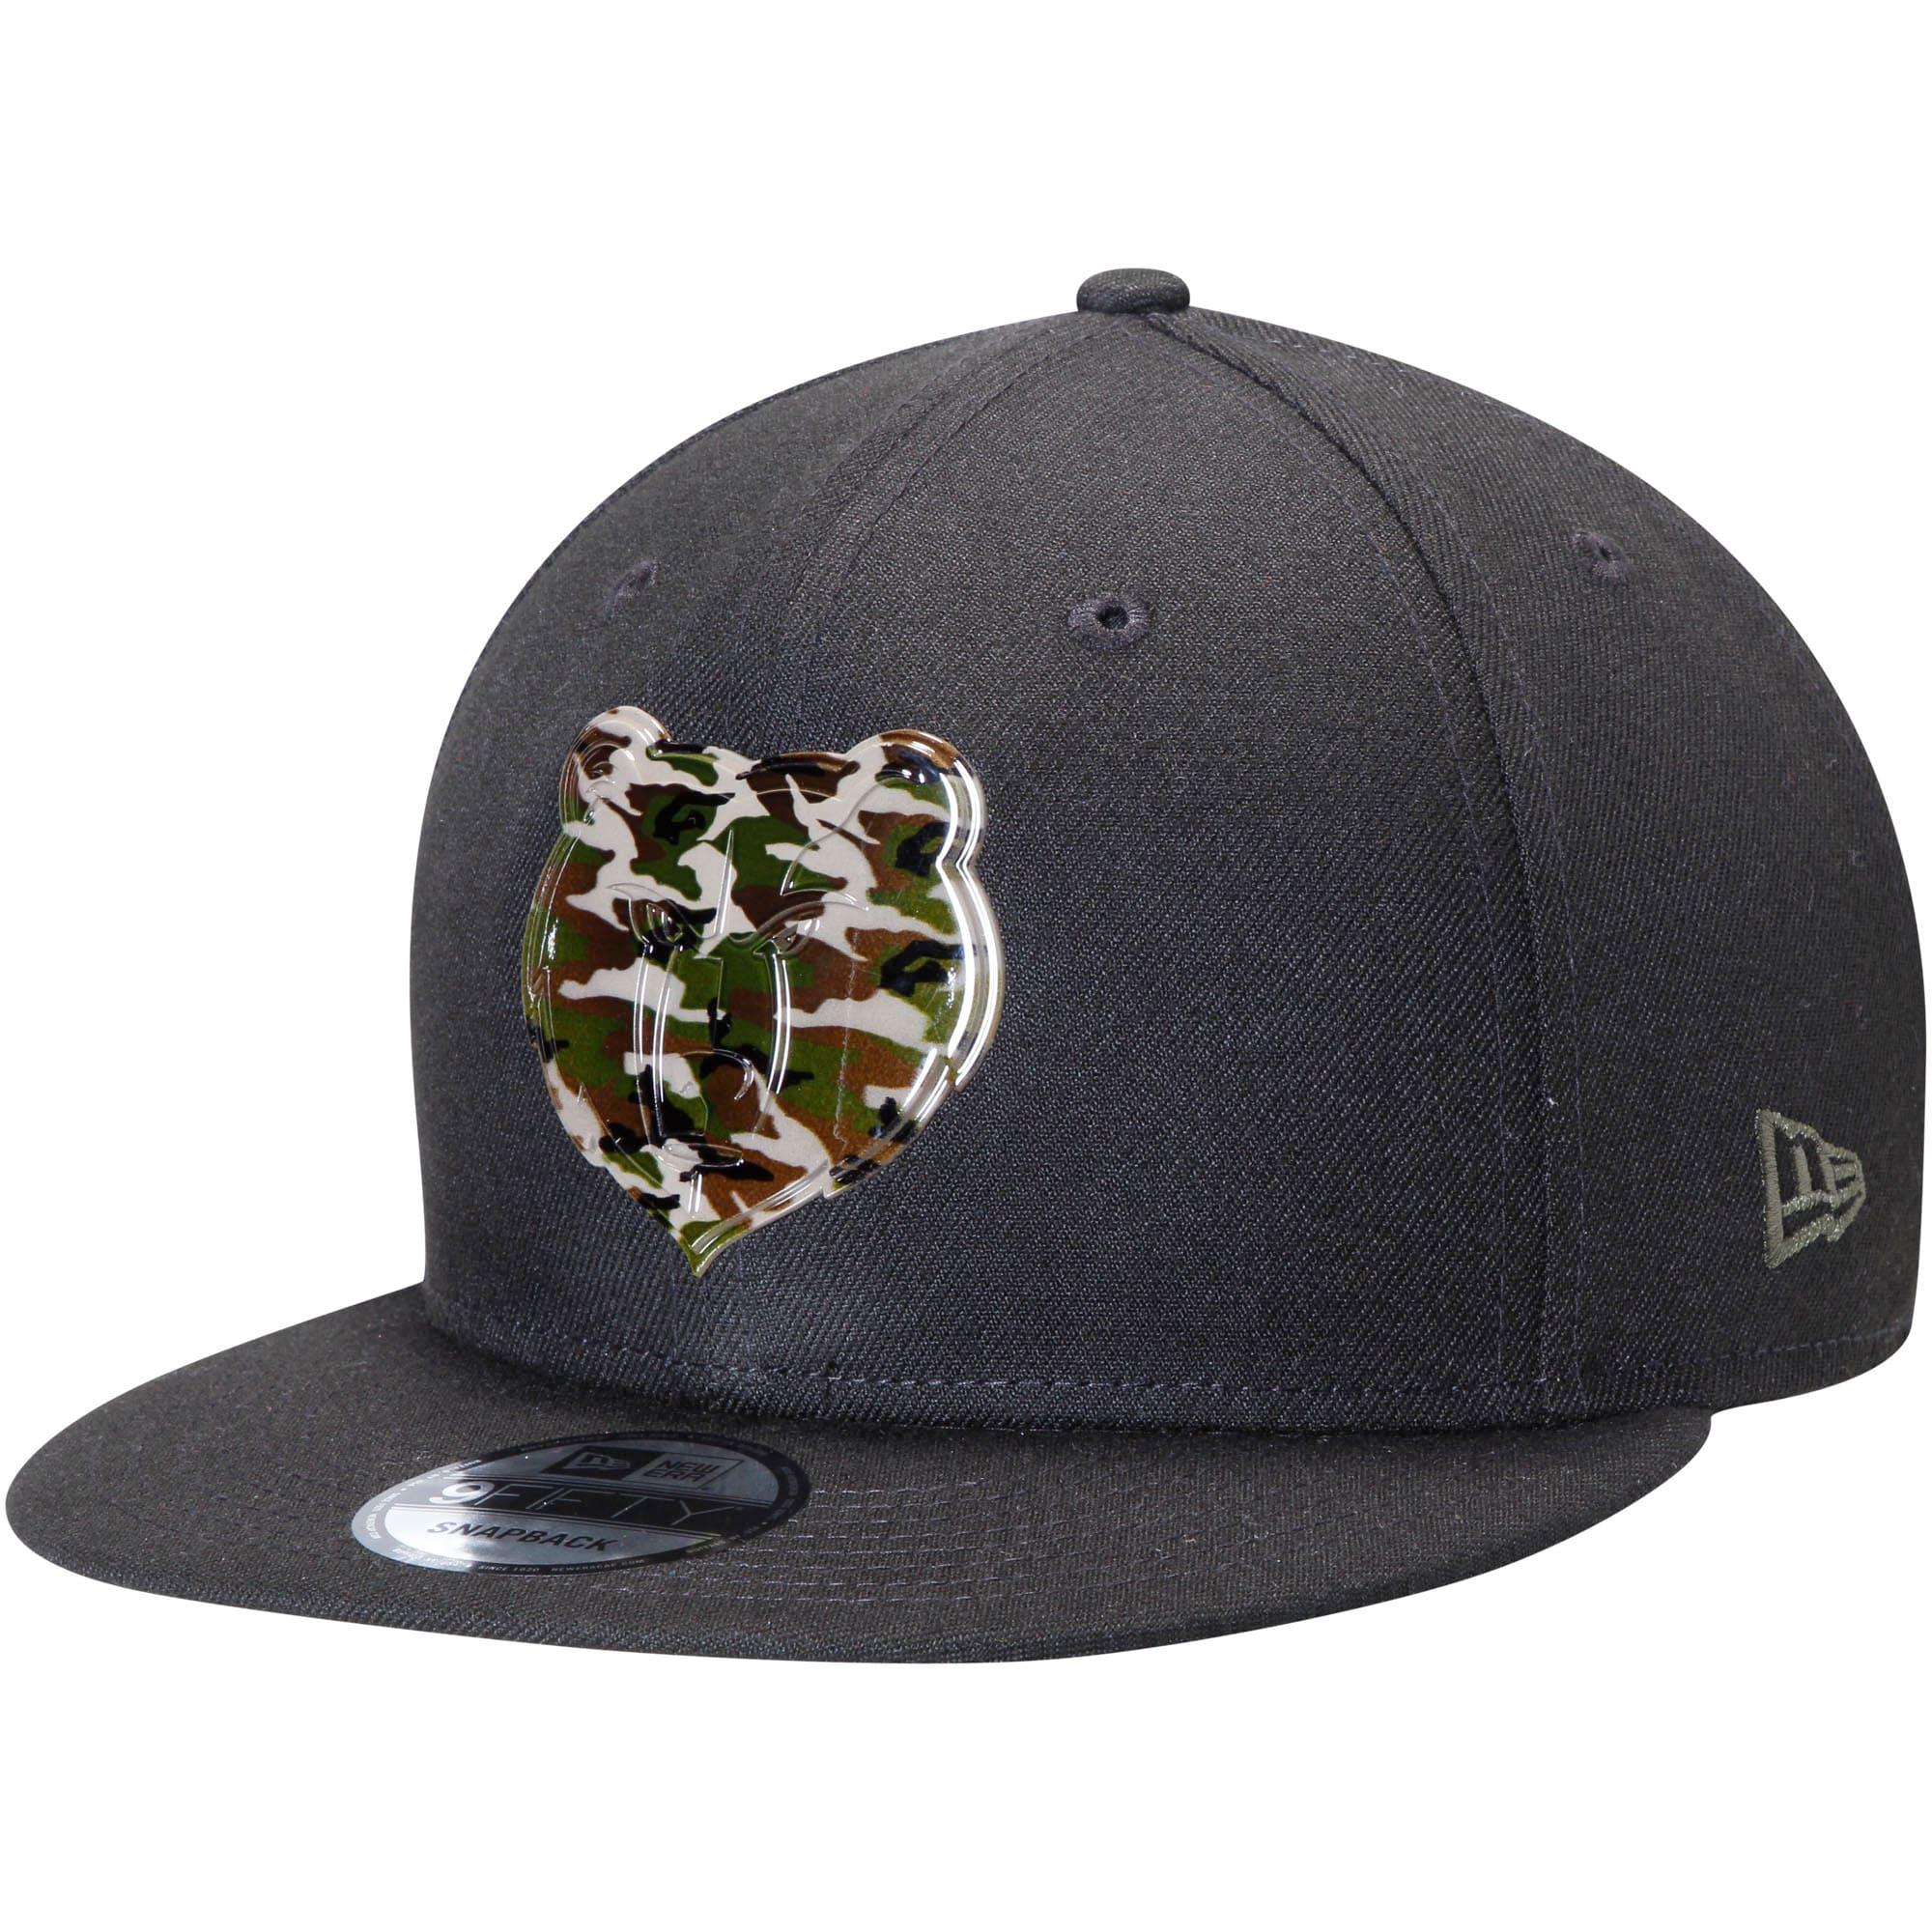 Memphis Grizzlies New Era Camo Badge 9FIFTY Adjustable Snapback Hat - Black